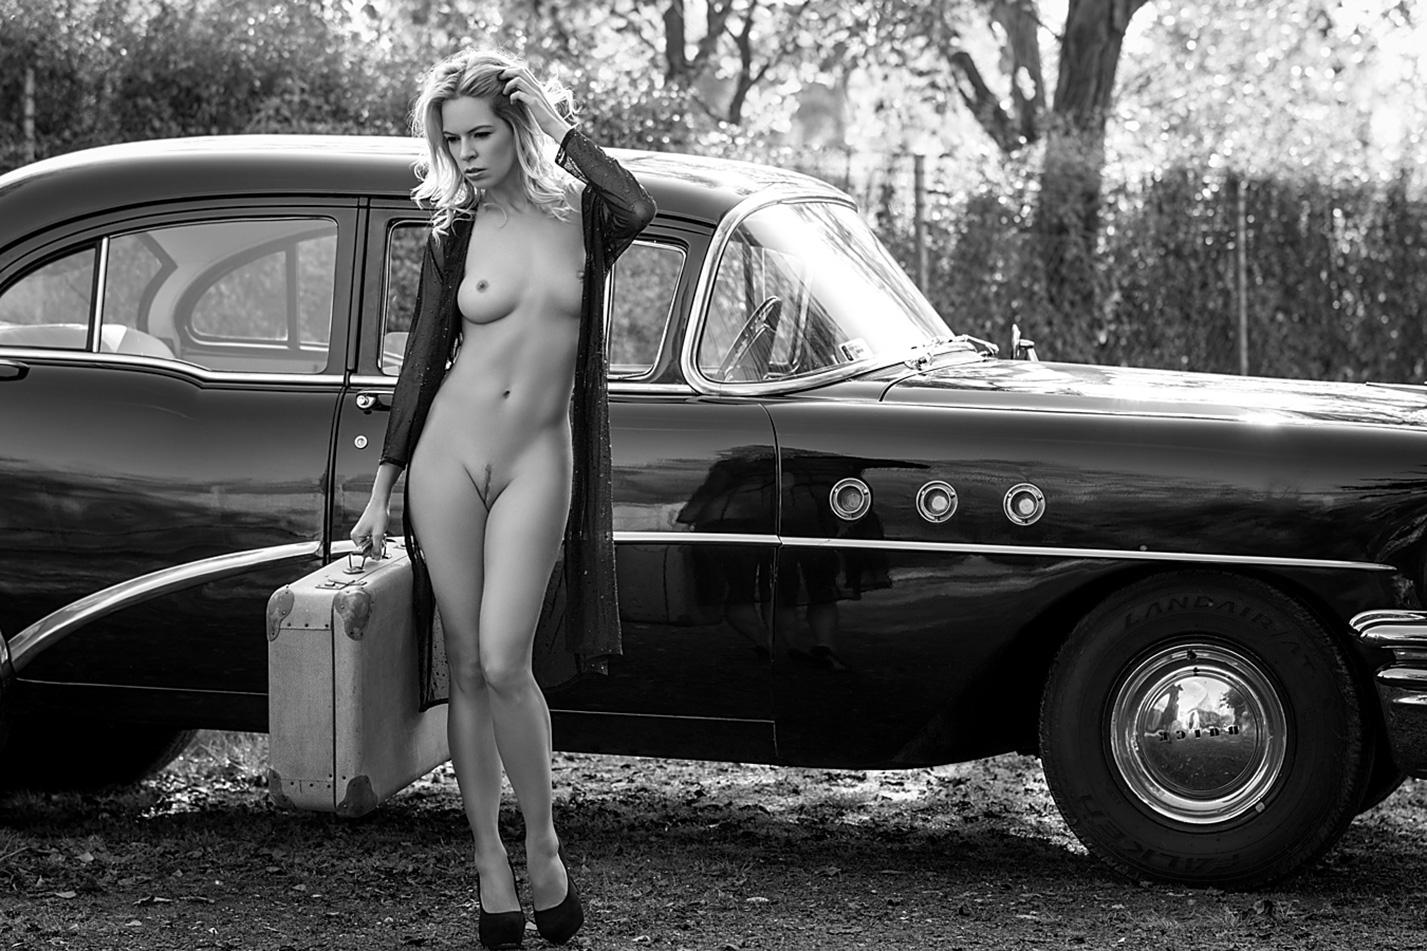 фрау Мюллер в винтажной машине Buick / Fanny Muller by Lajos Csaki